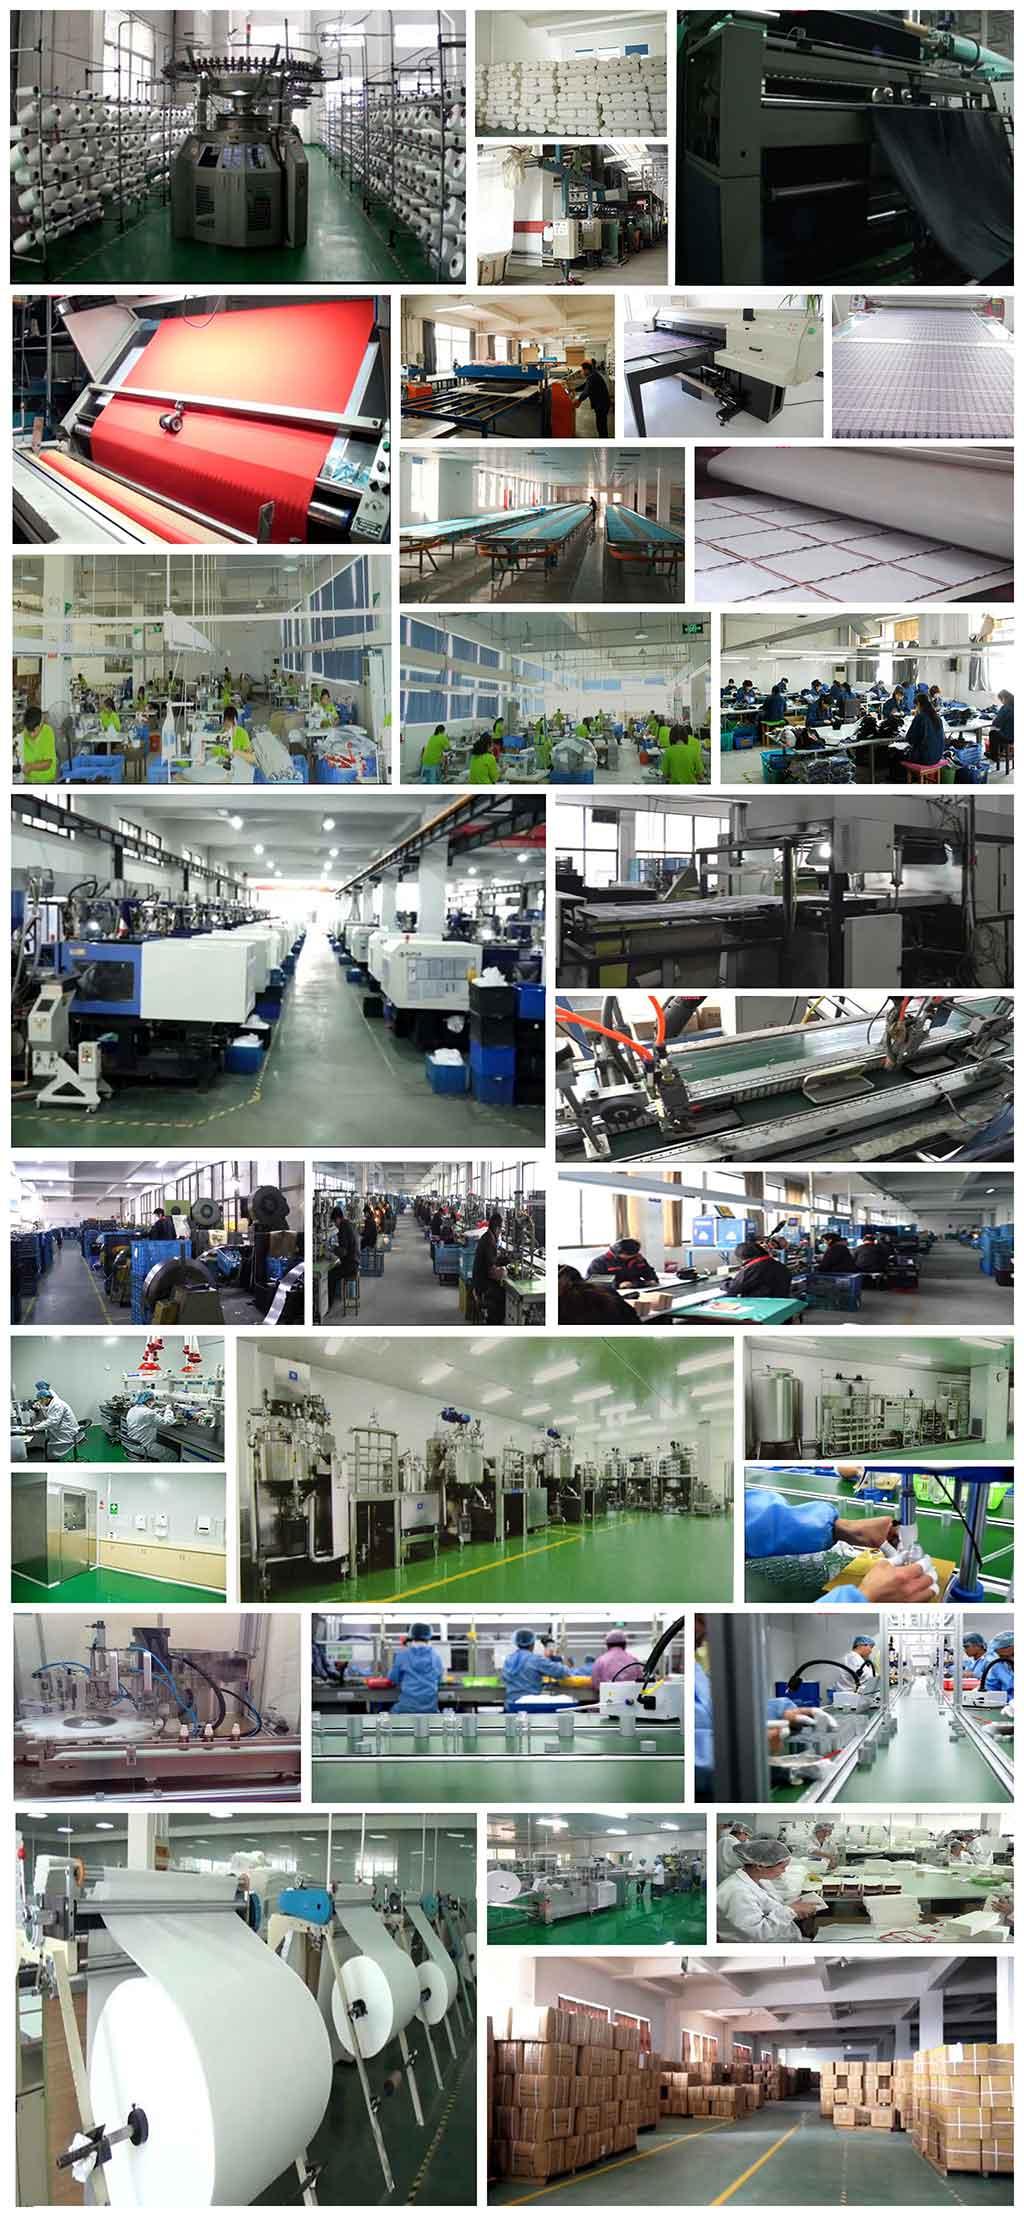 benern manufactory